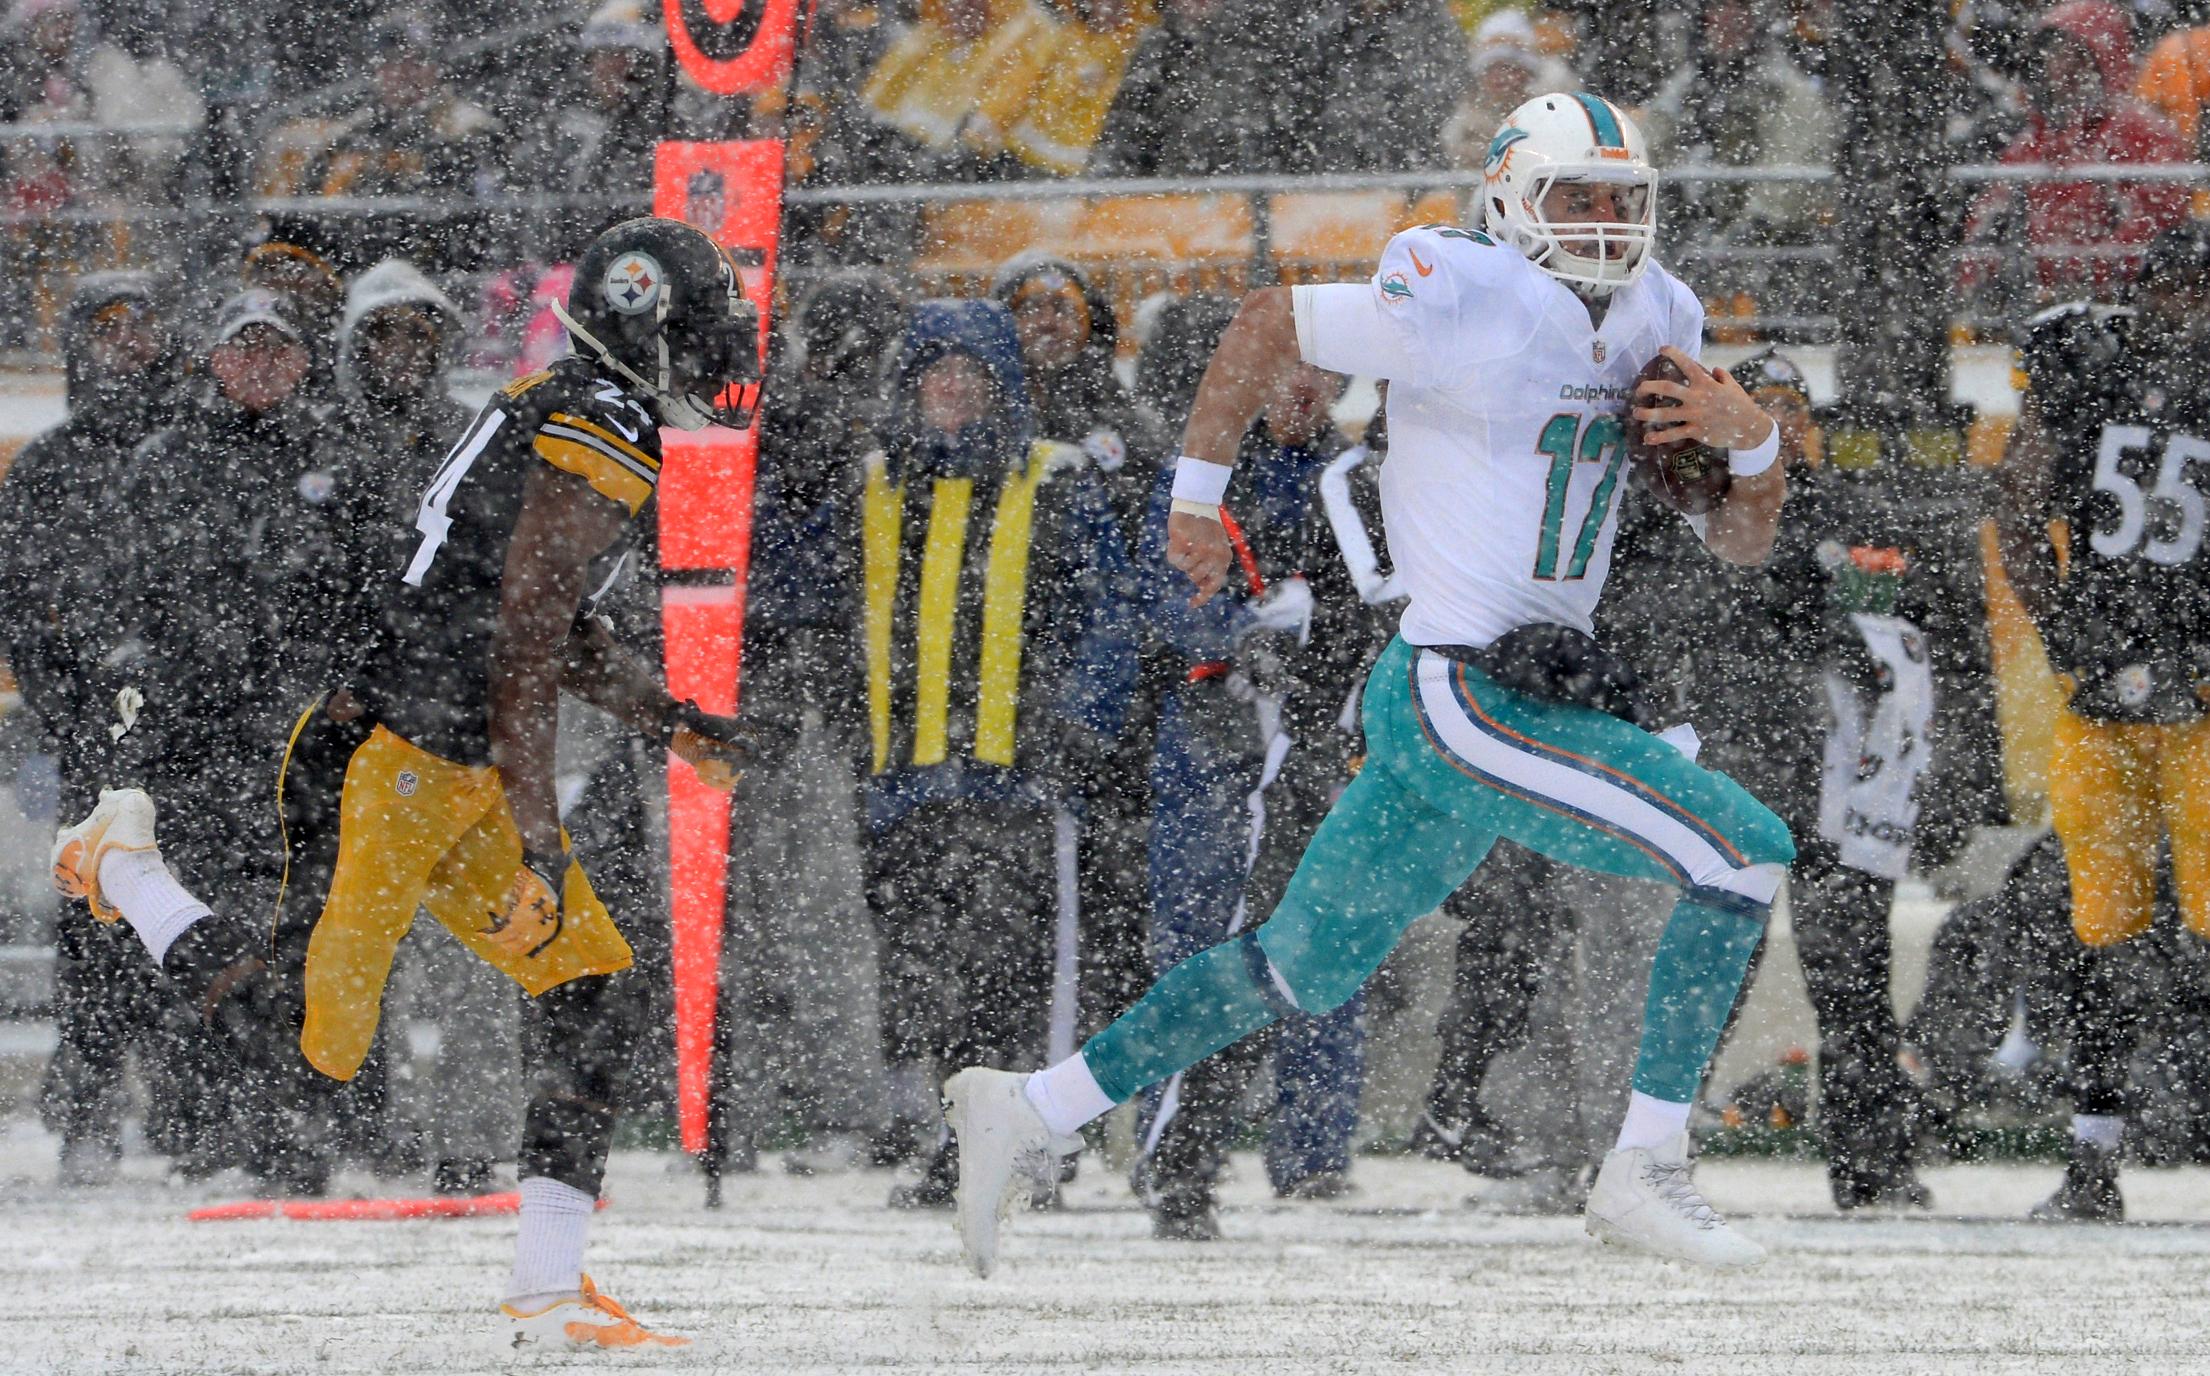 Steelers Notebook: Defense blown open again